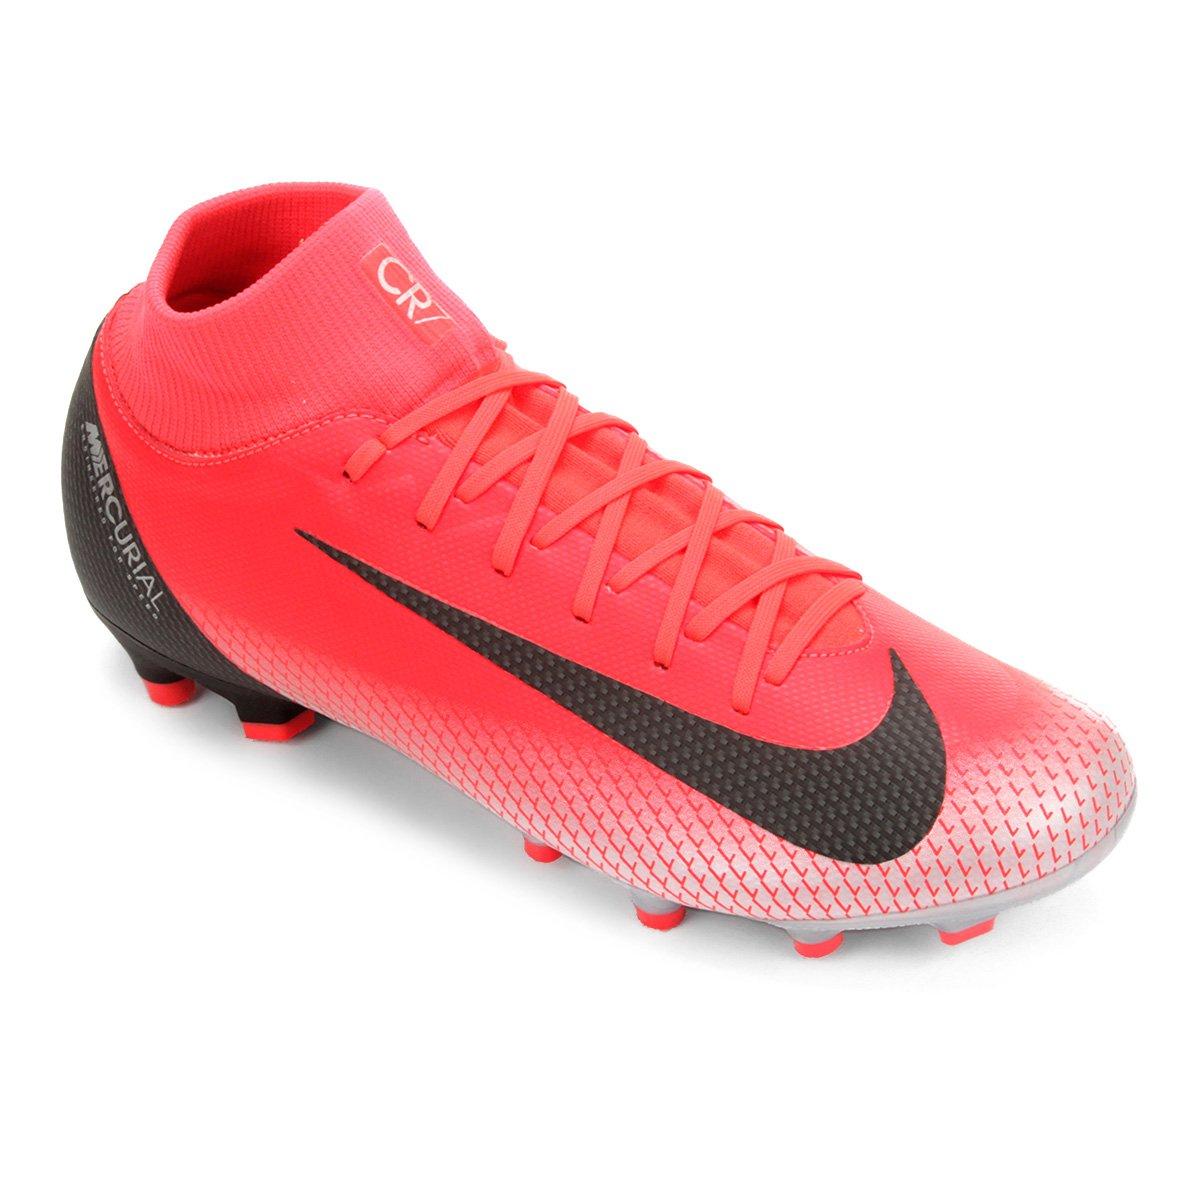 cd48894049 Chuteira Campo Nike Superfly 6 Academy CR7 FG - Vermelho e Cinza ...